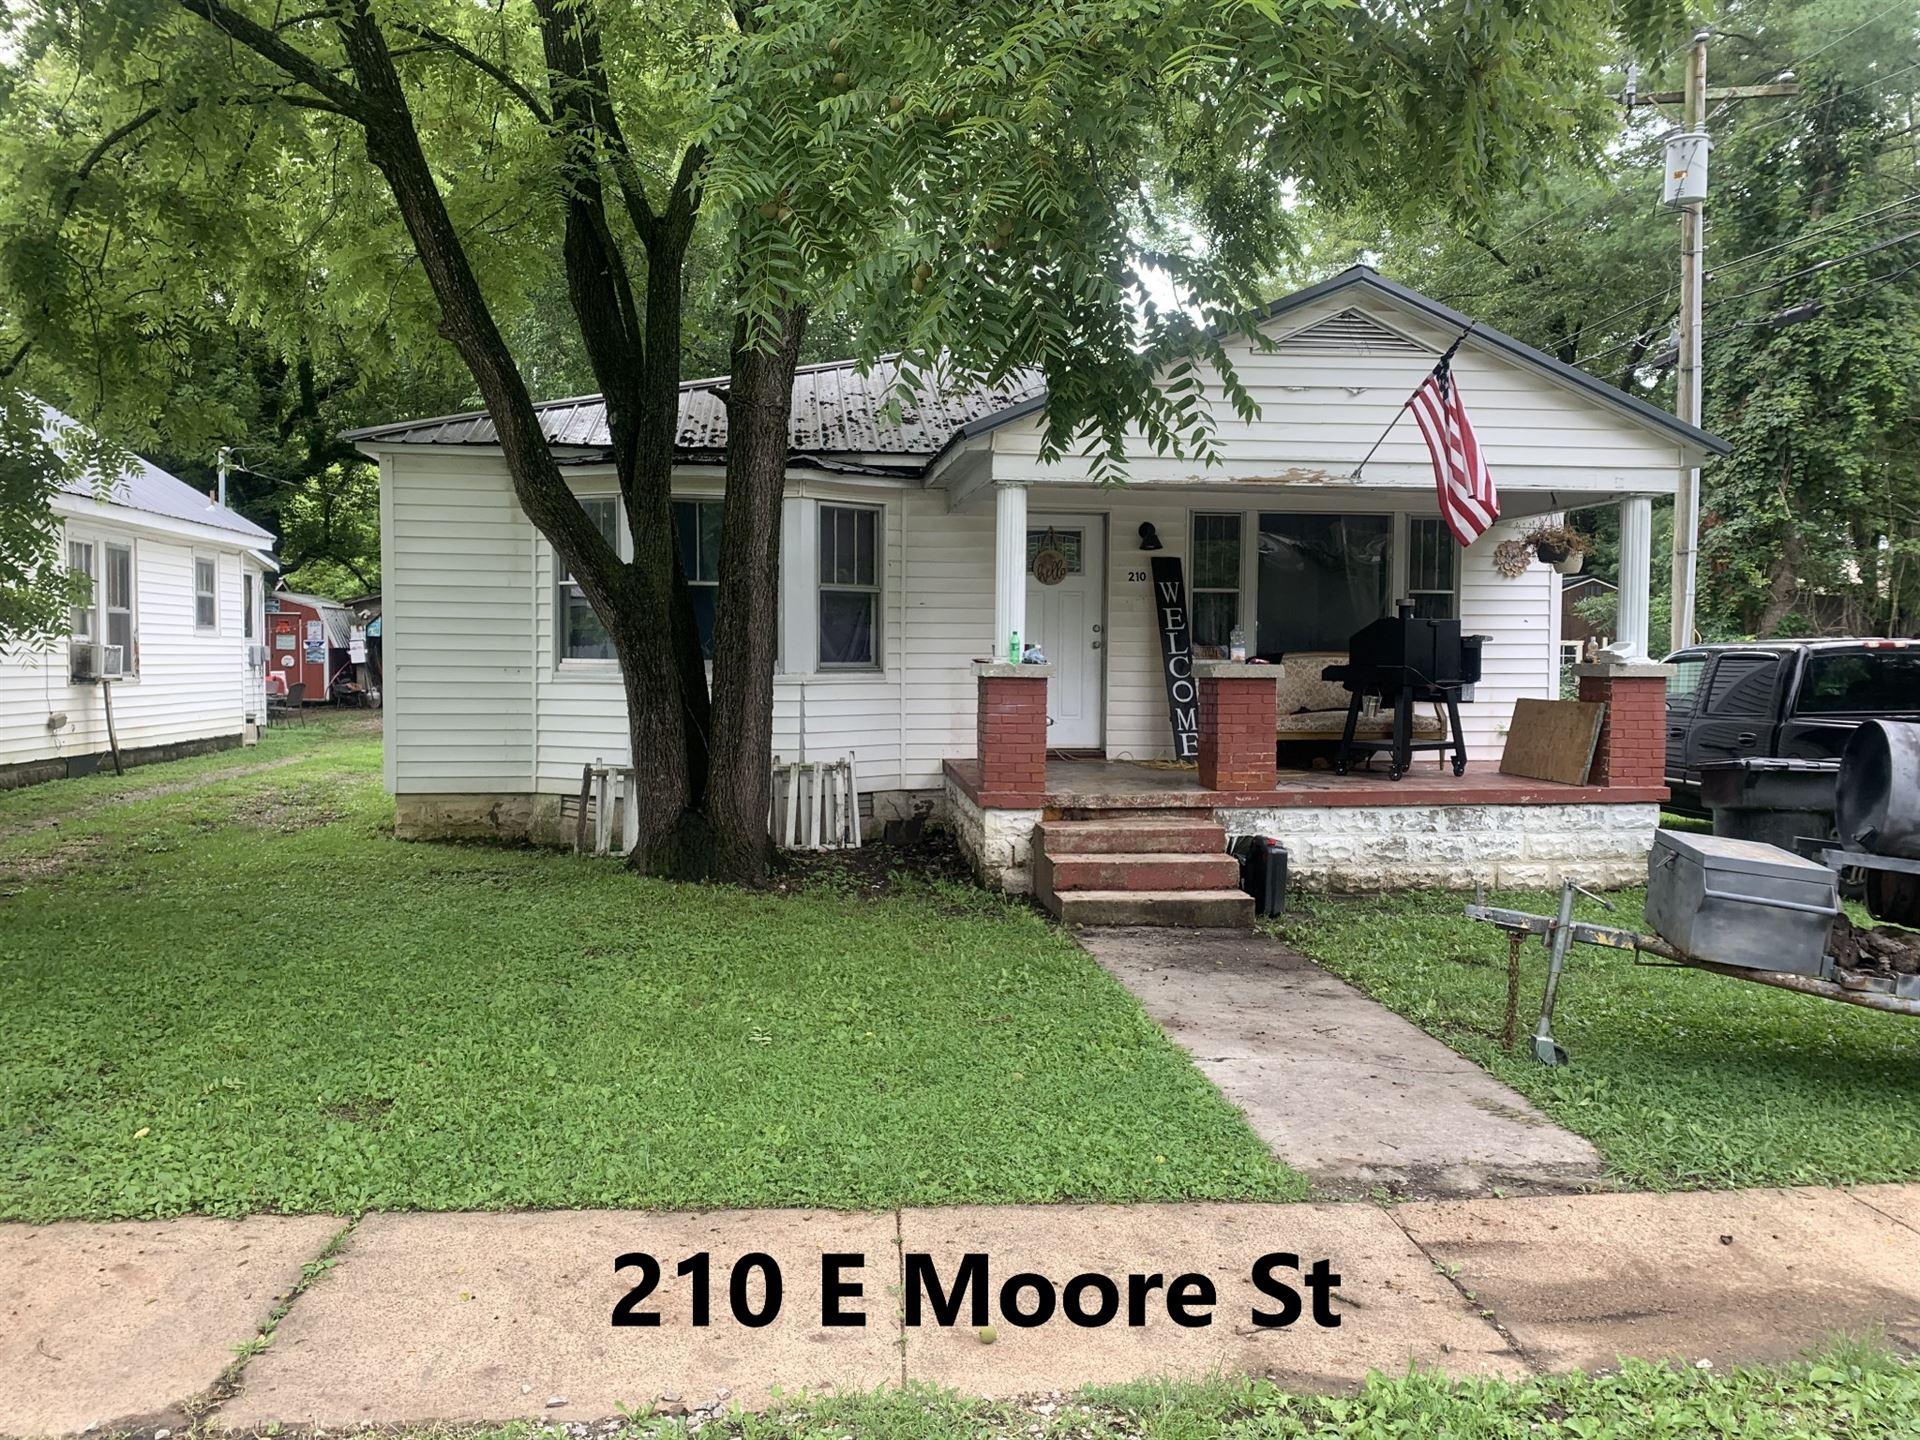 212 E Moore St, Tullahoma, TN 37388 - MLS#: 2276544